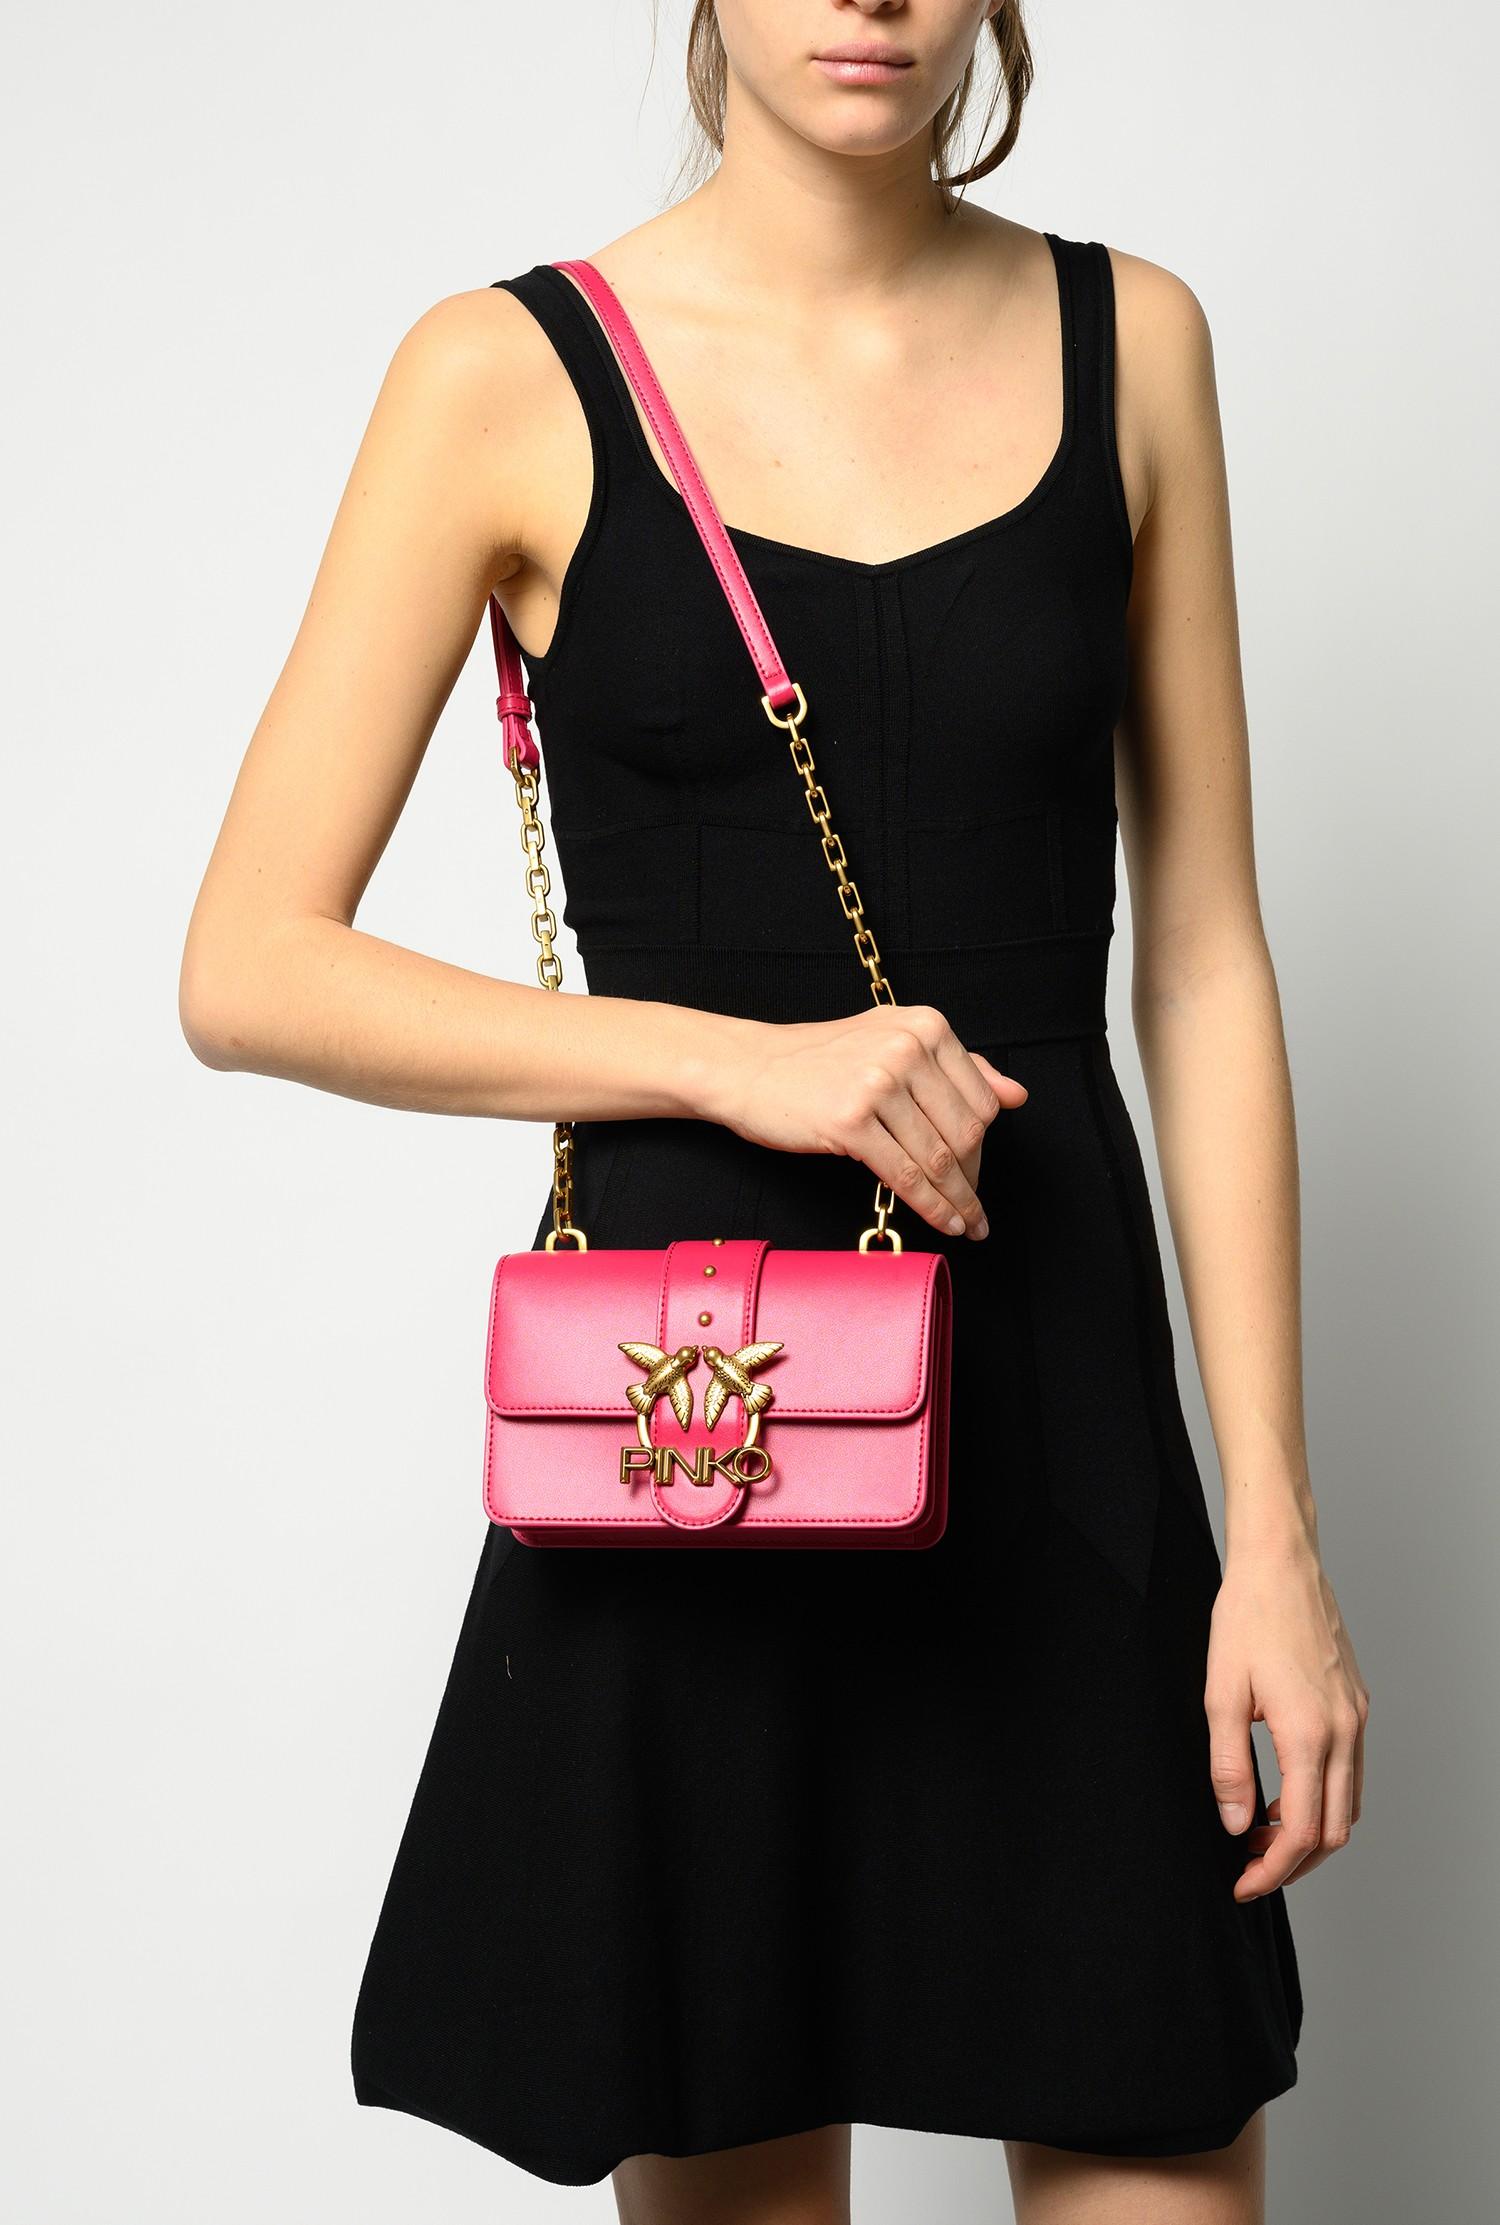 Pinko love mini icon simply 4 bag